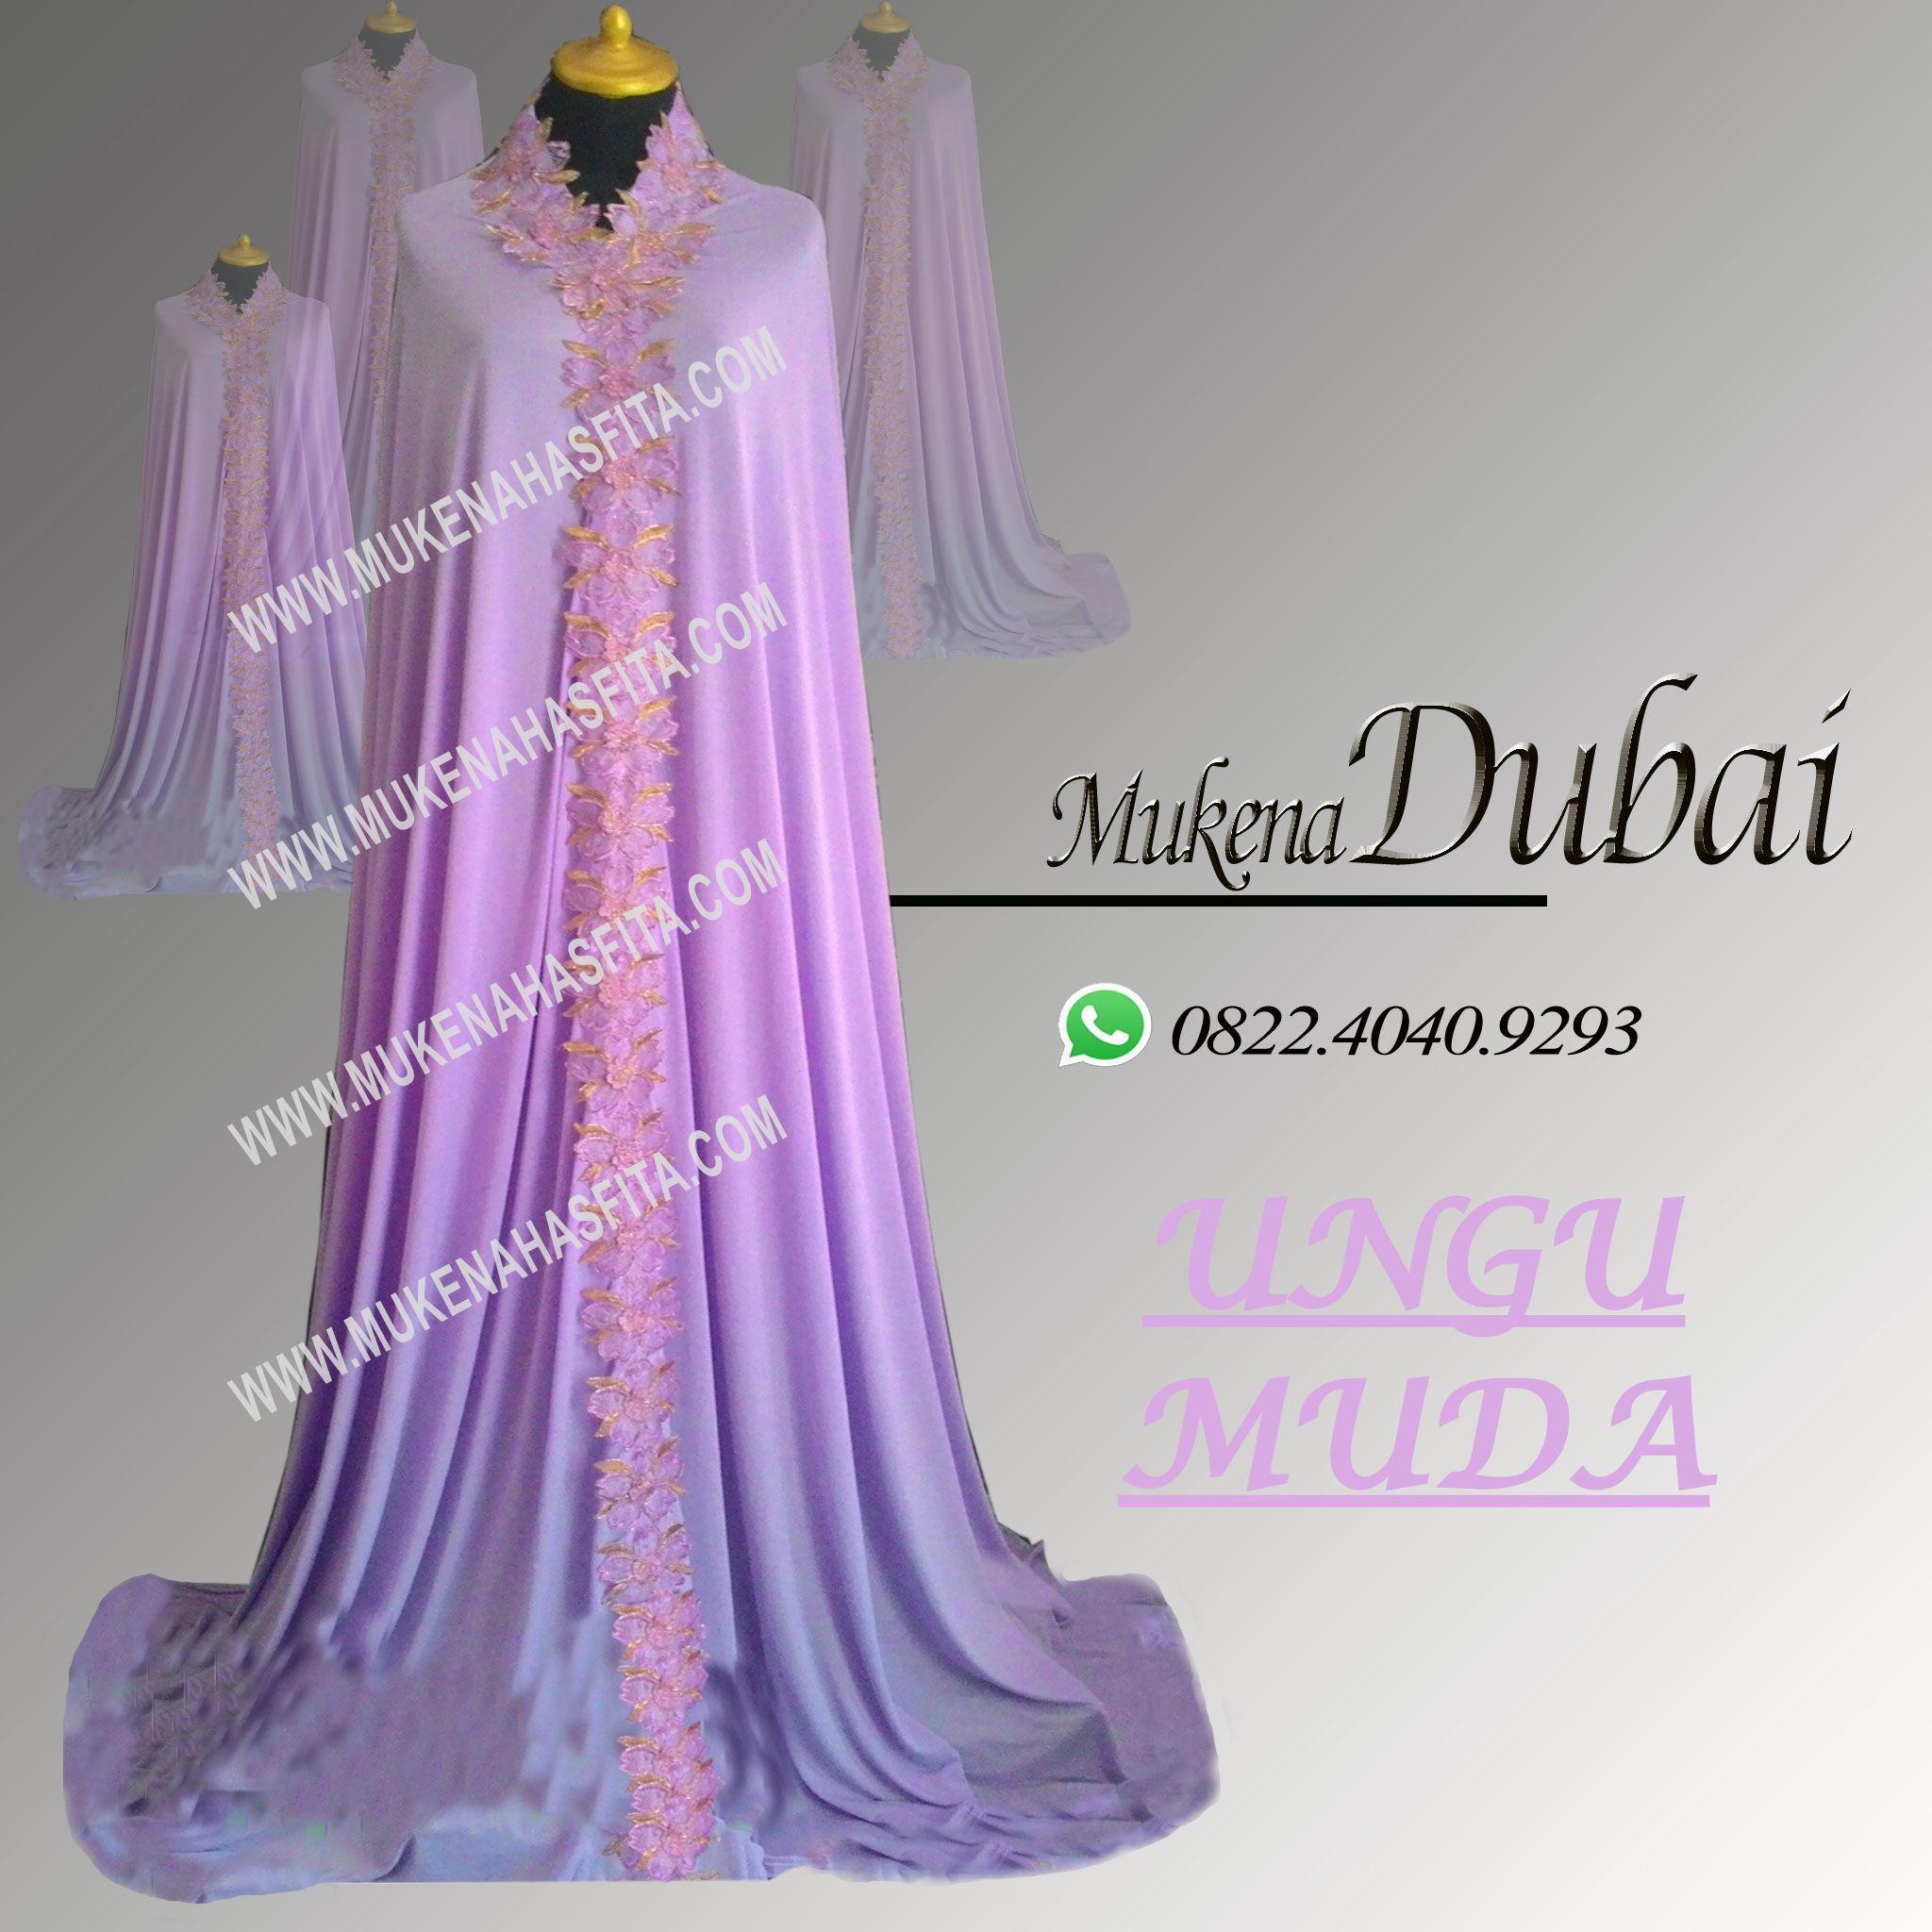 Mukena Dubai 2016 Mukena Dubai Bordir Mukena Dubai Berlengan